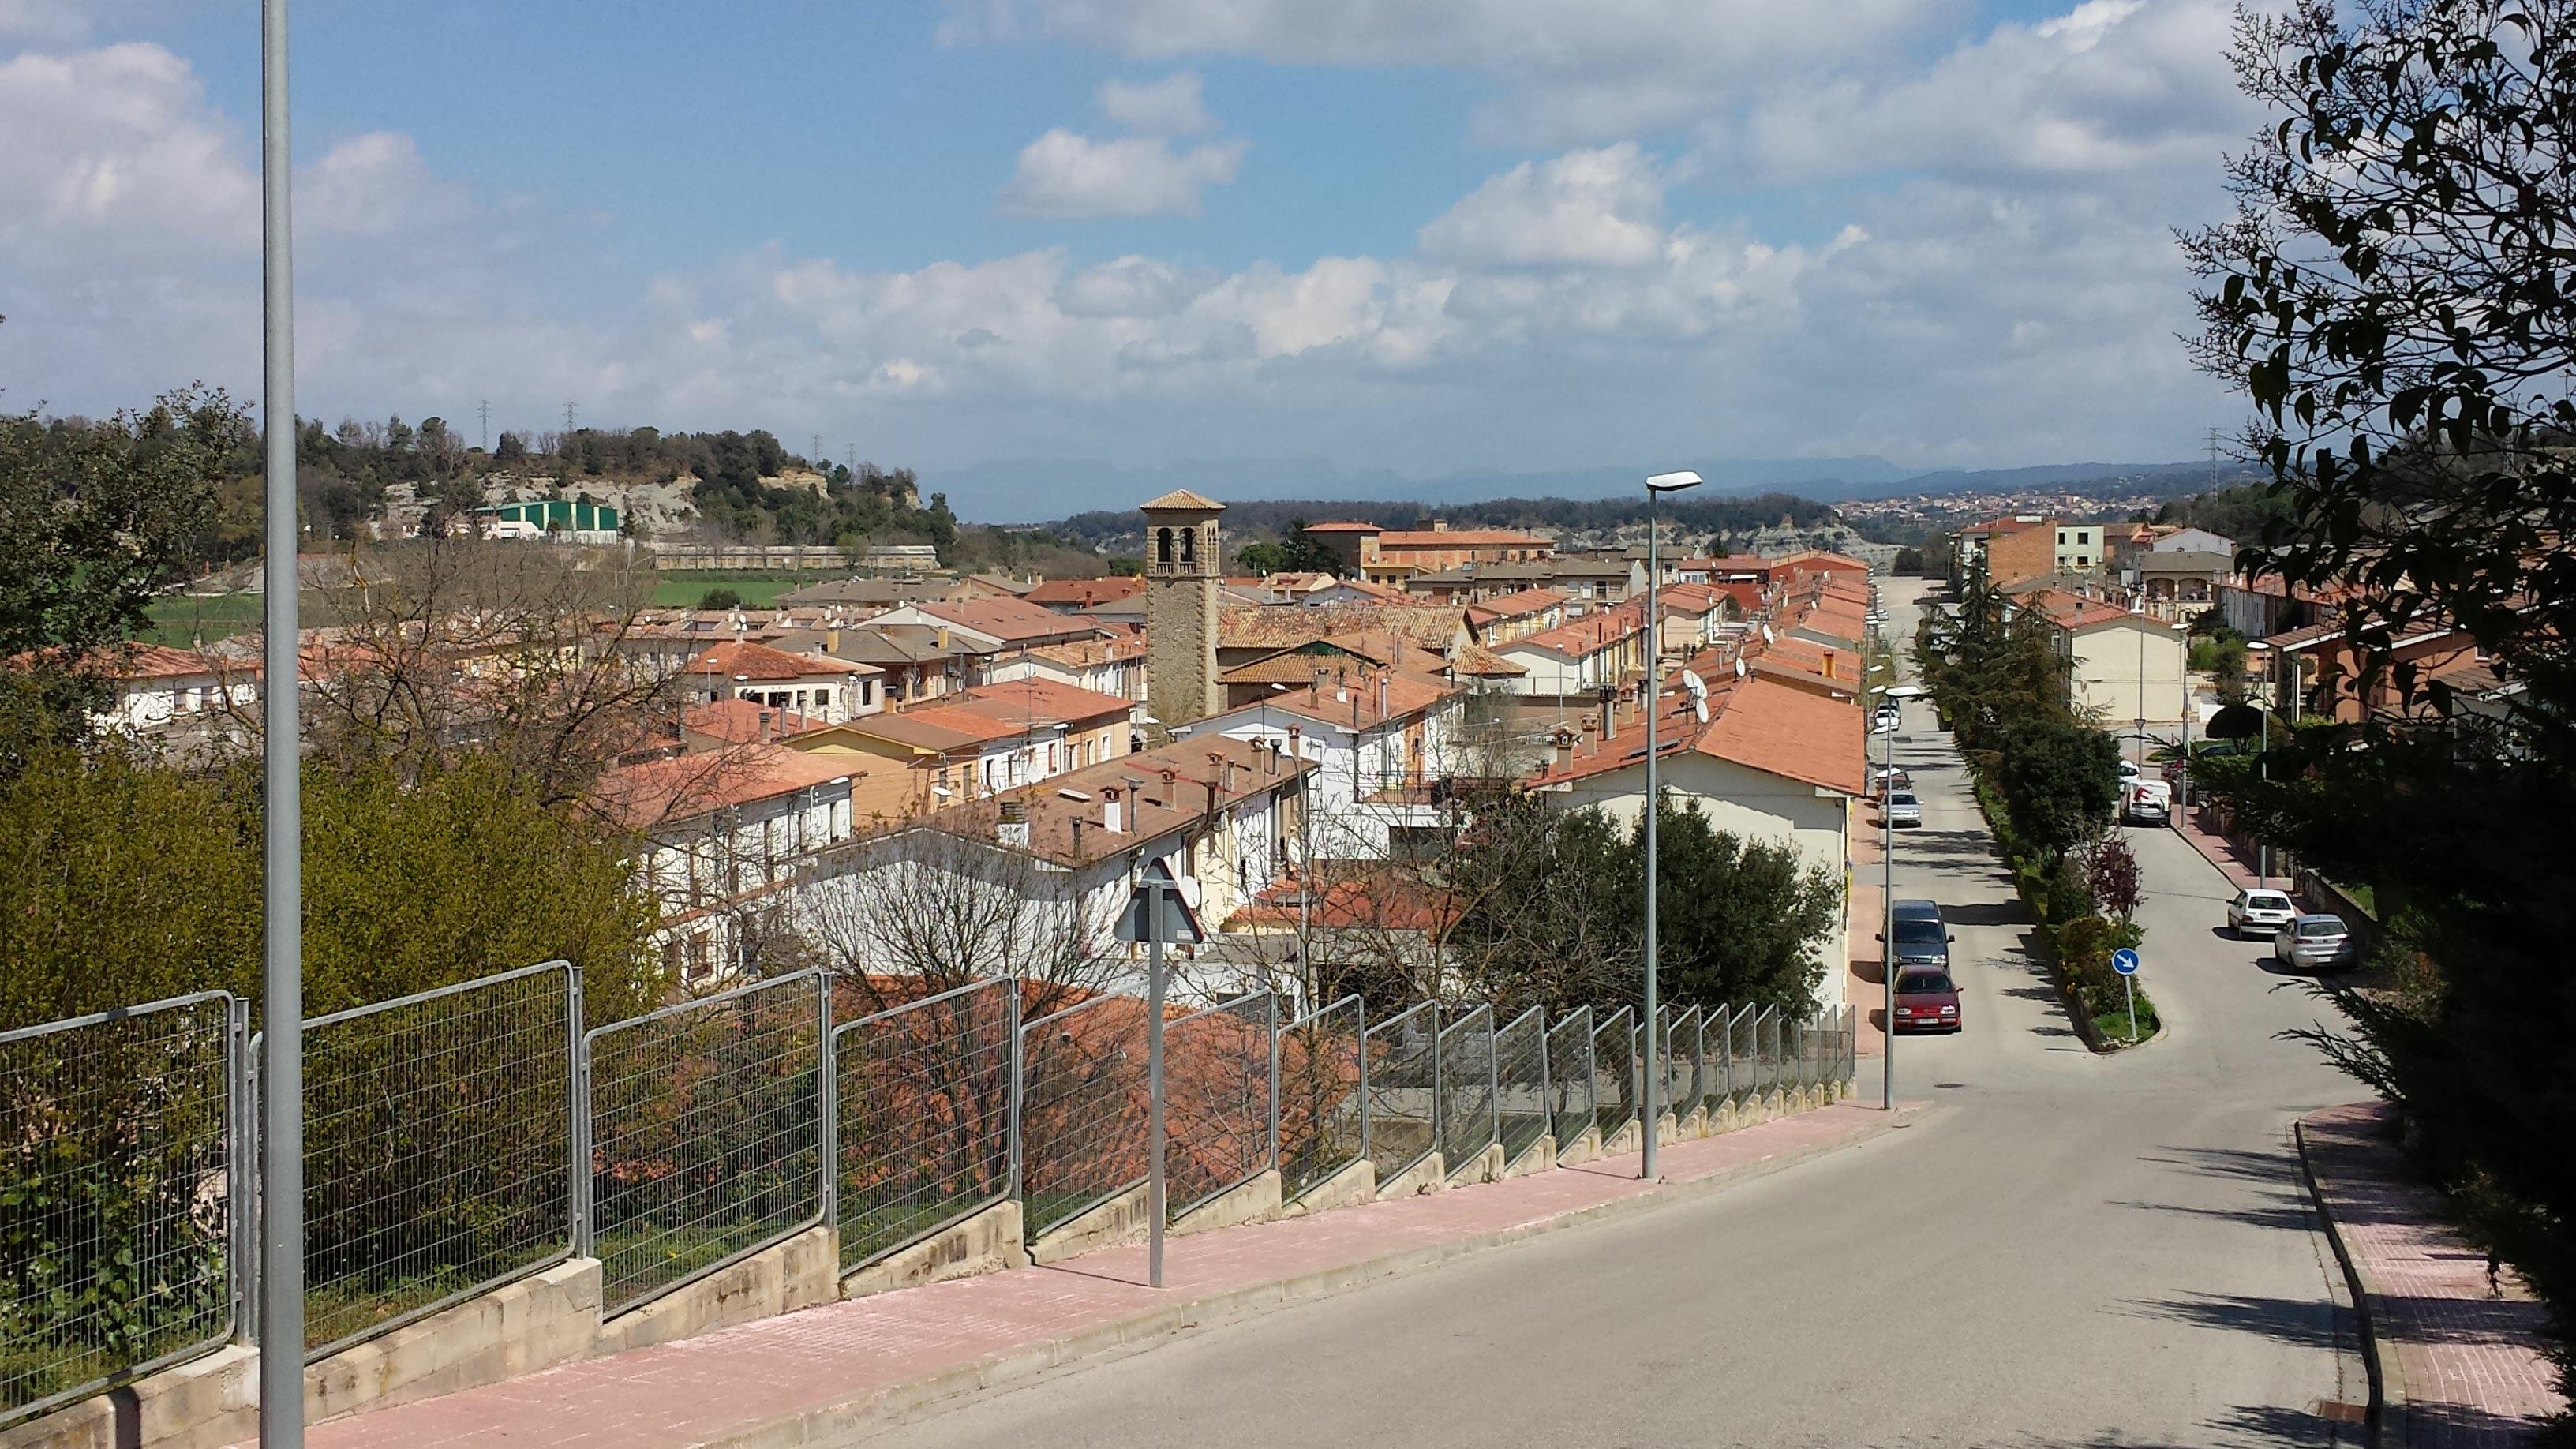 Itinerari verd Plaça Sardà- Escoles-Plaça Església (Tram 2)